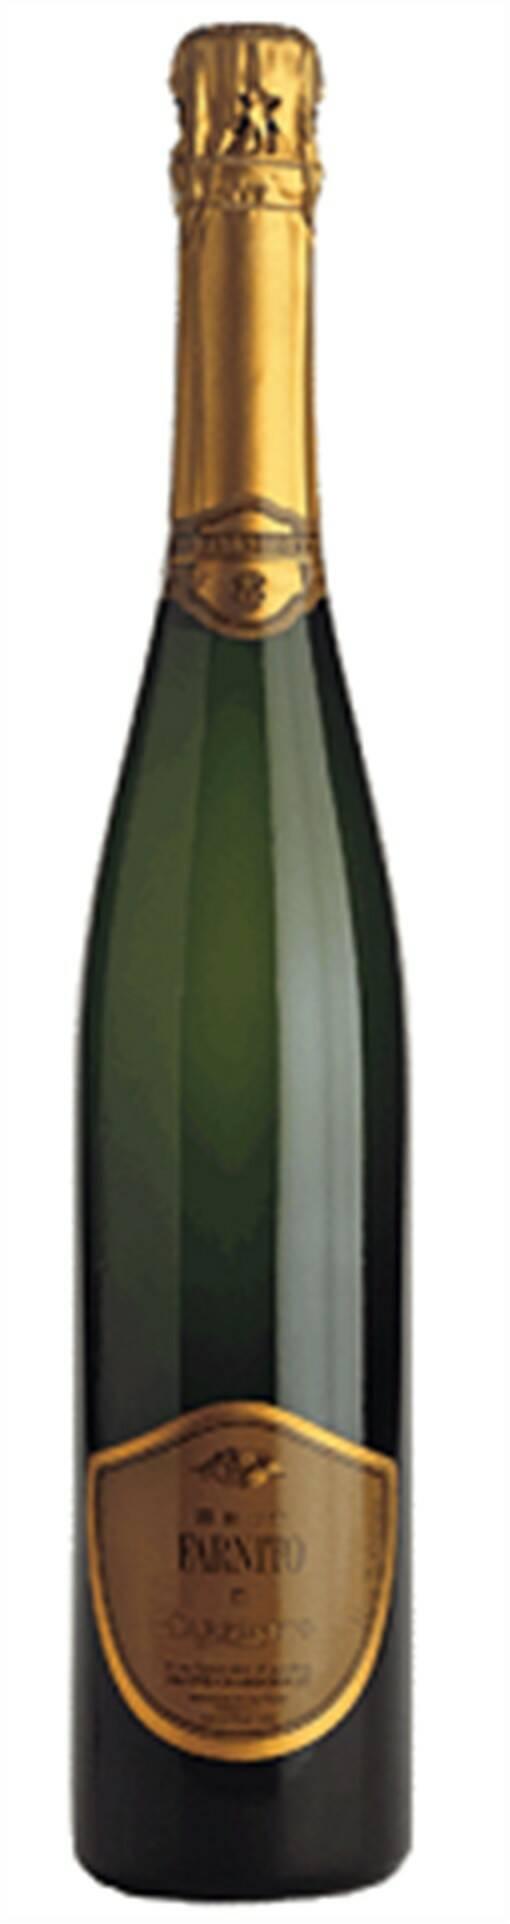 ::: 酒類介紹 :::芳宜多頂級精釀氣泡酒 Farnito Chardonnay Brut (Sparkling)